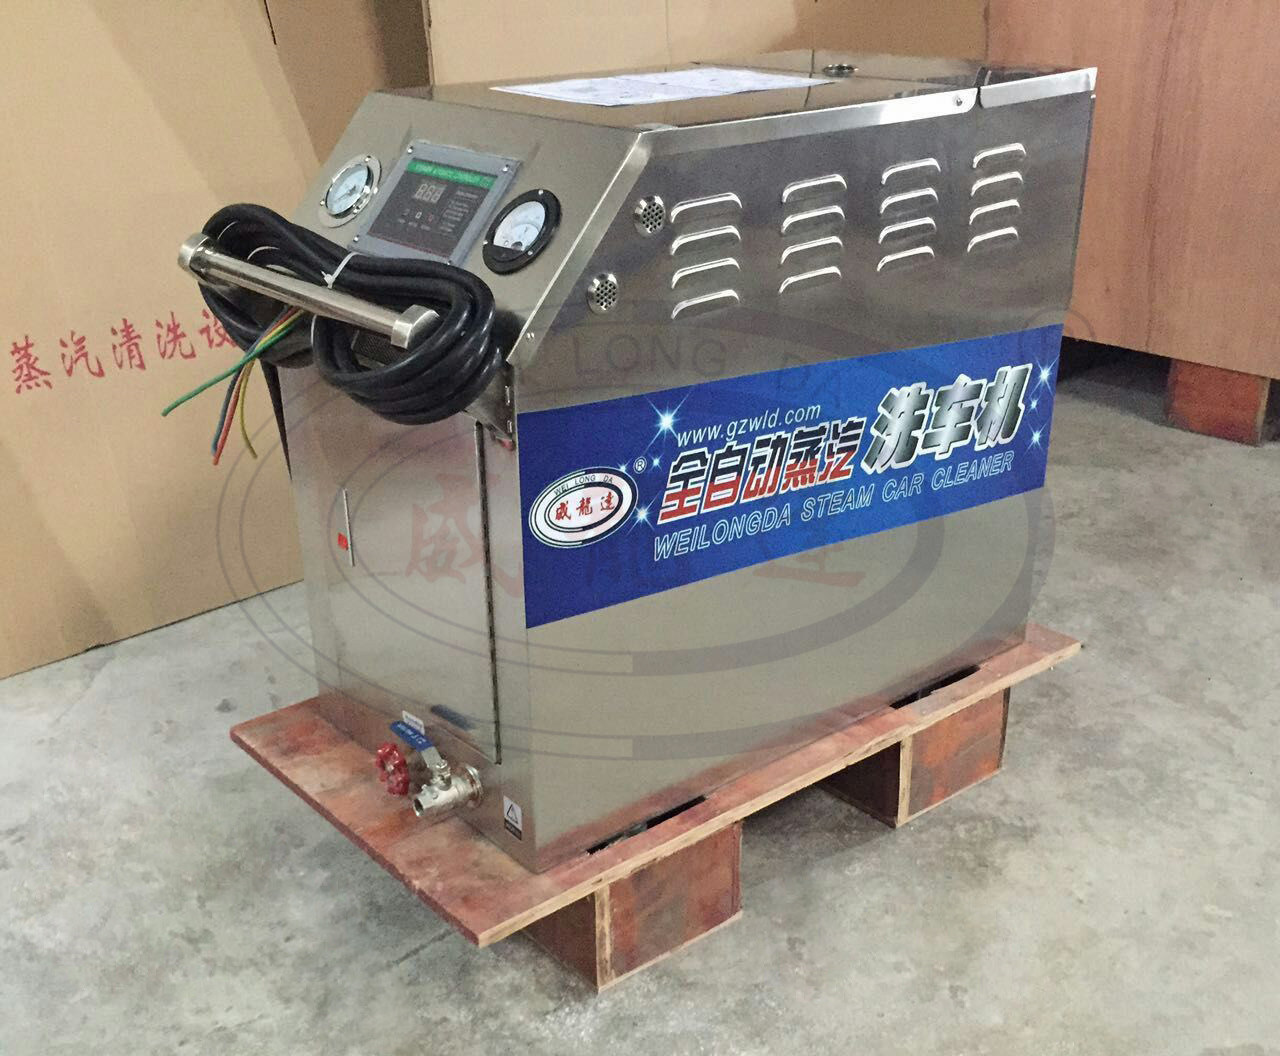 Wld2060 Portable Electric Steam Car Washing Machine/Car Washer